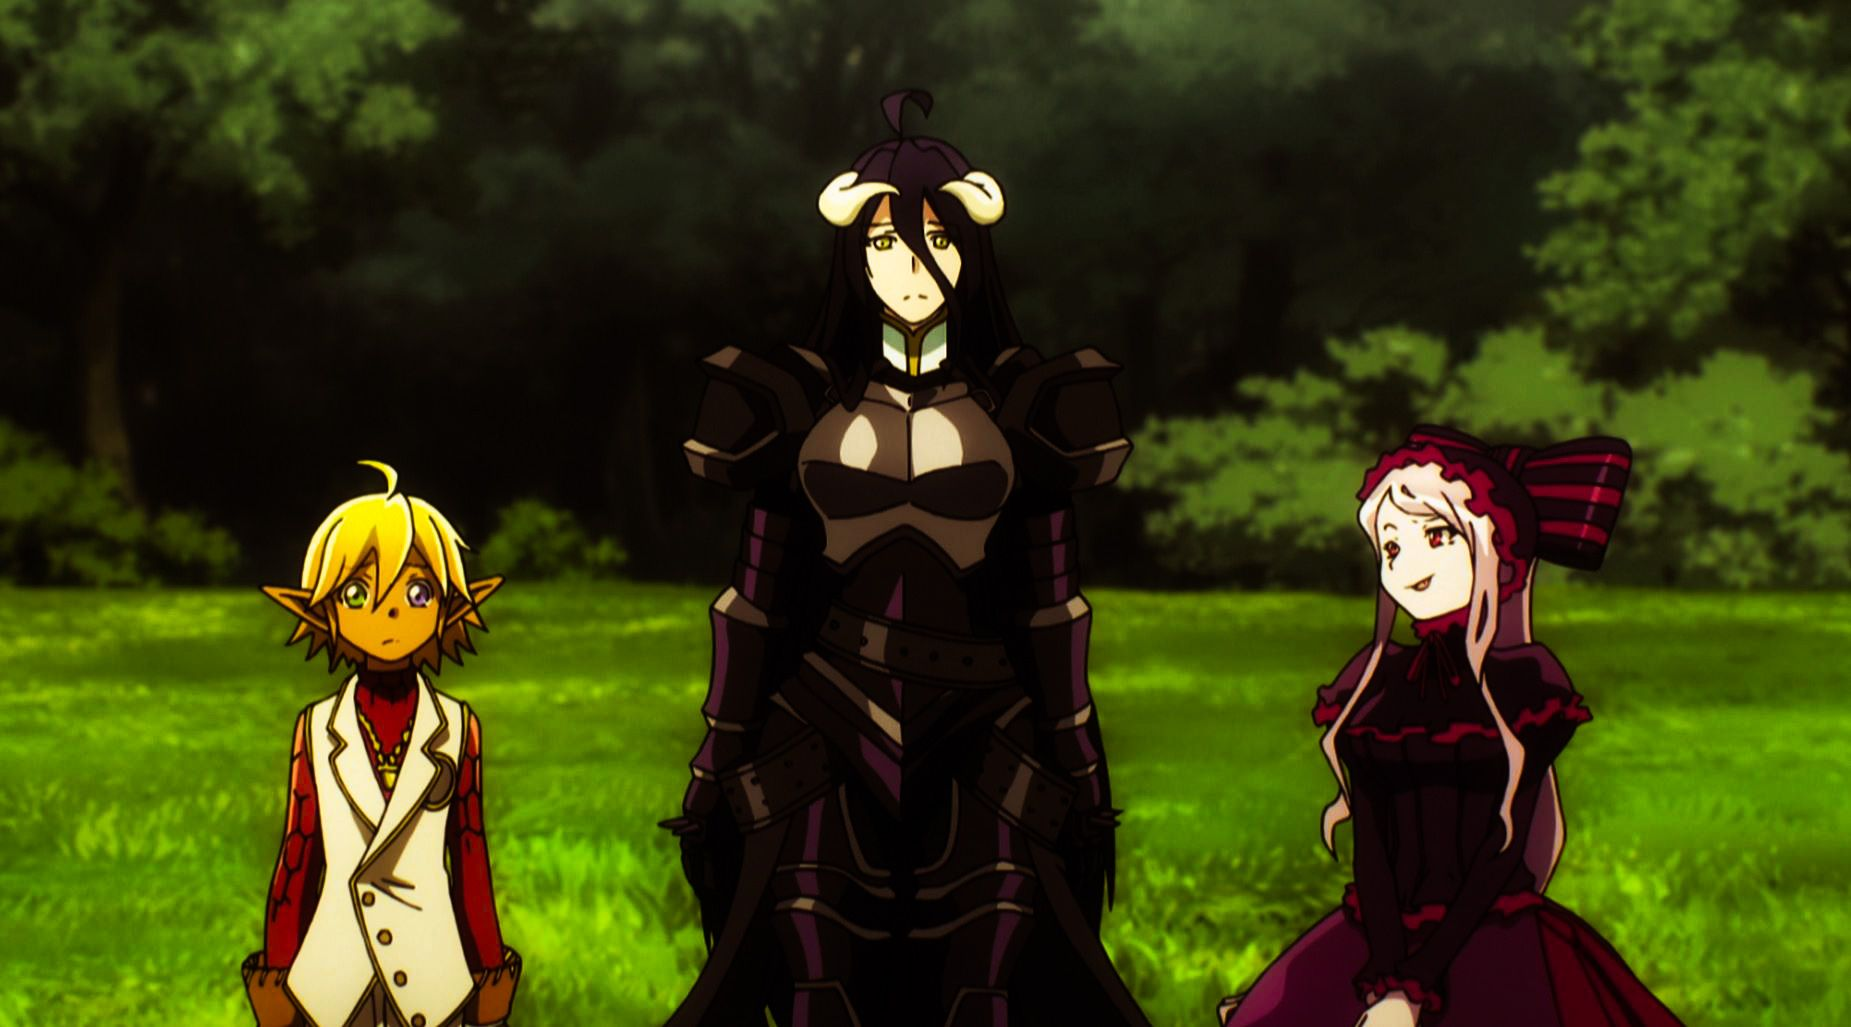 overlord Greatest villains, Anime reviews, Anime